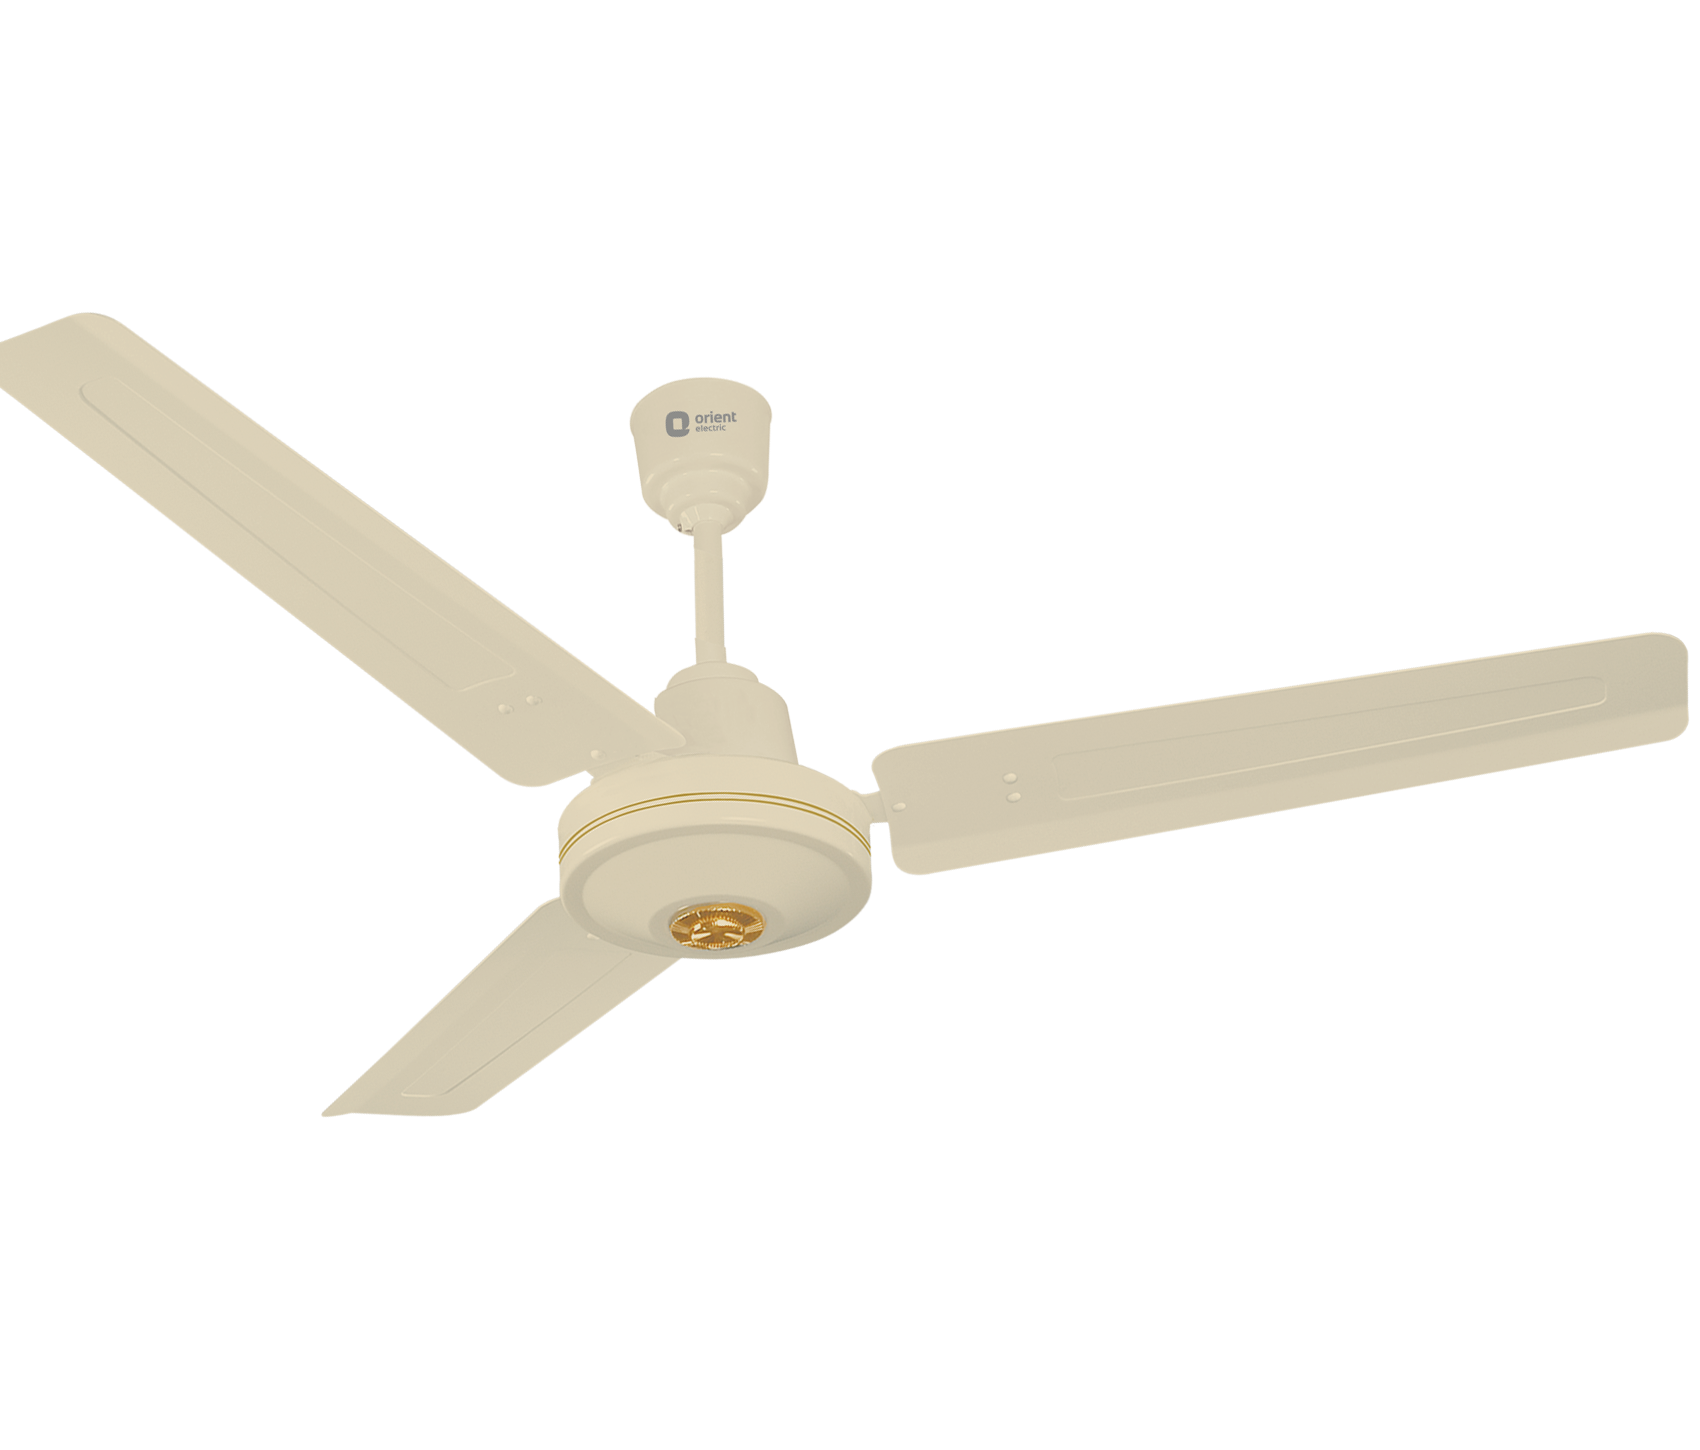 orient_56_deluxe_ceiling_fan_1.png